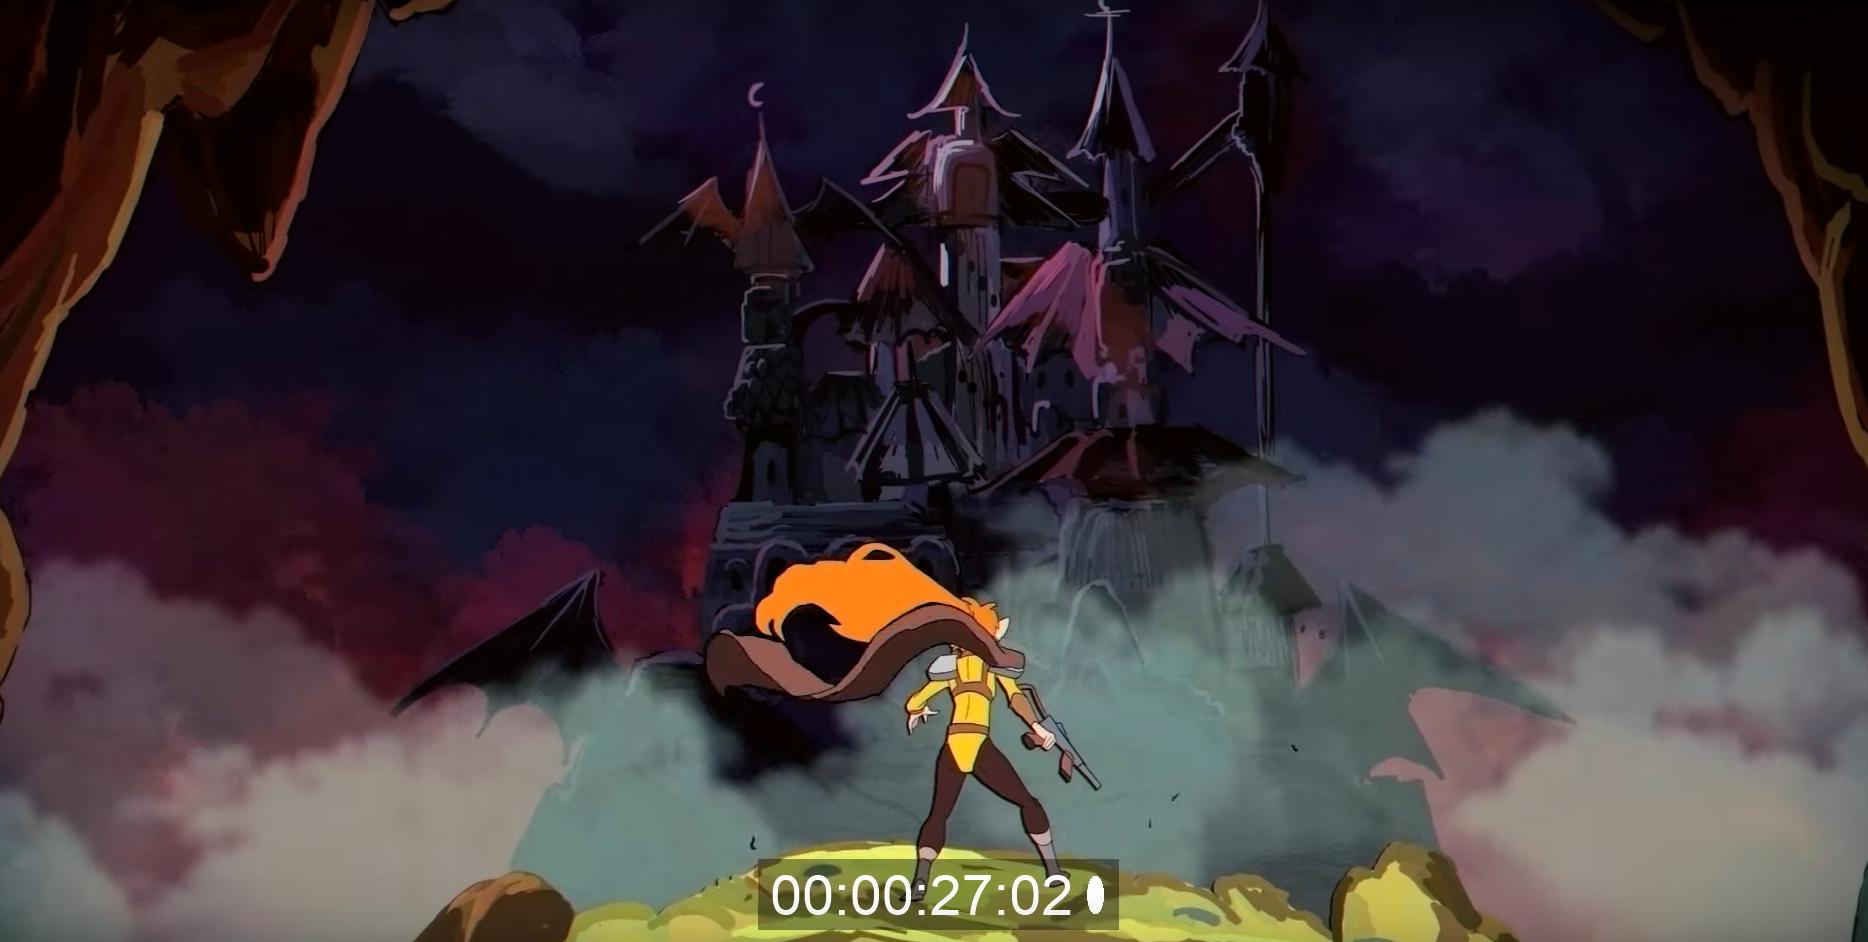 Короткометражка: Dream Bandits — трейлер фэнтези мультсериала в духе 90-х 5